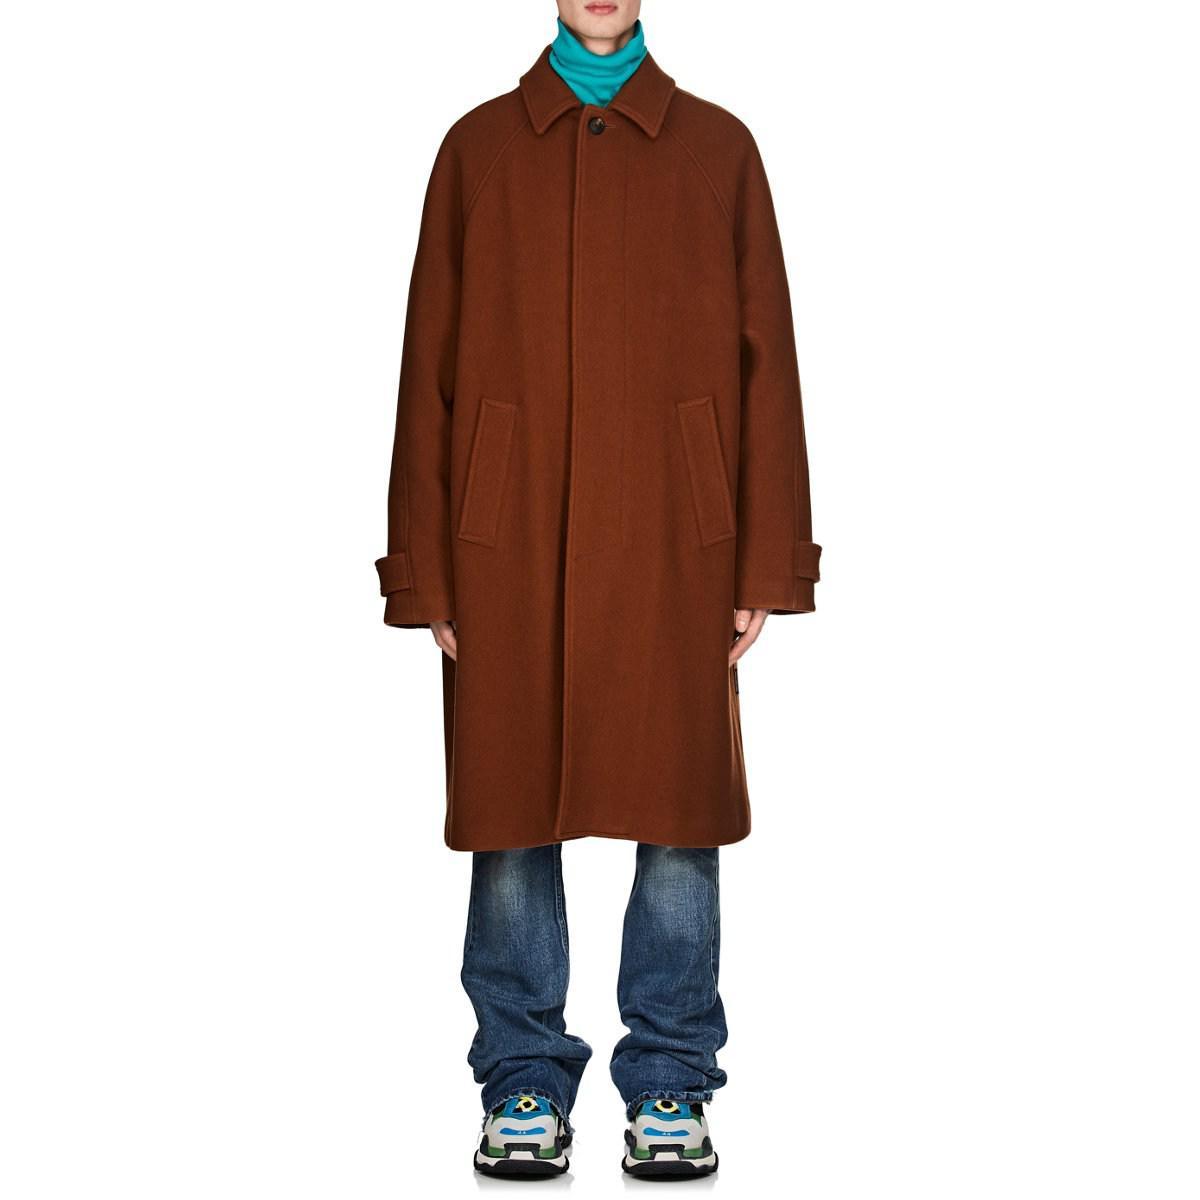 Lyst Balenciaga Brown Coat Opera Virgin Wool For Men In Melton Trench qaOFwqC